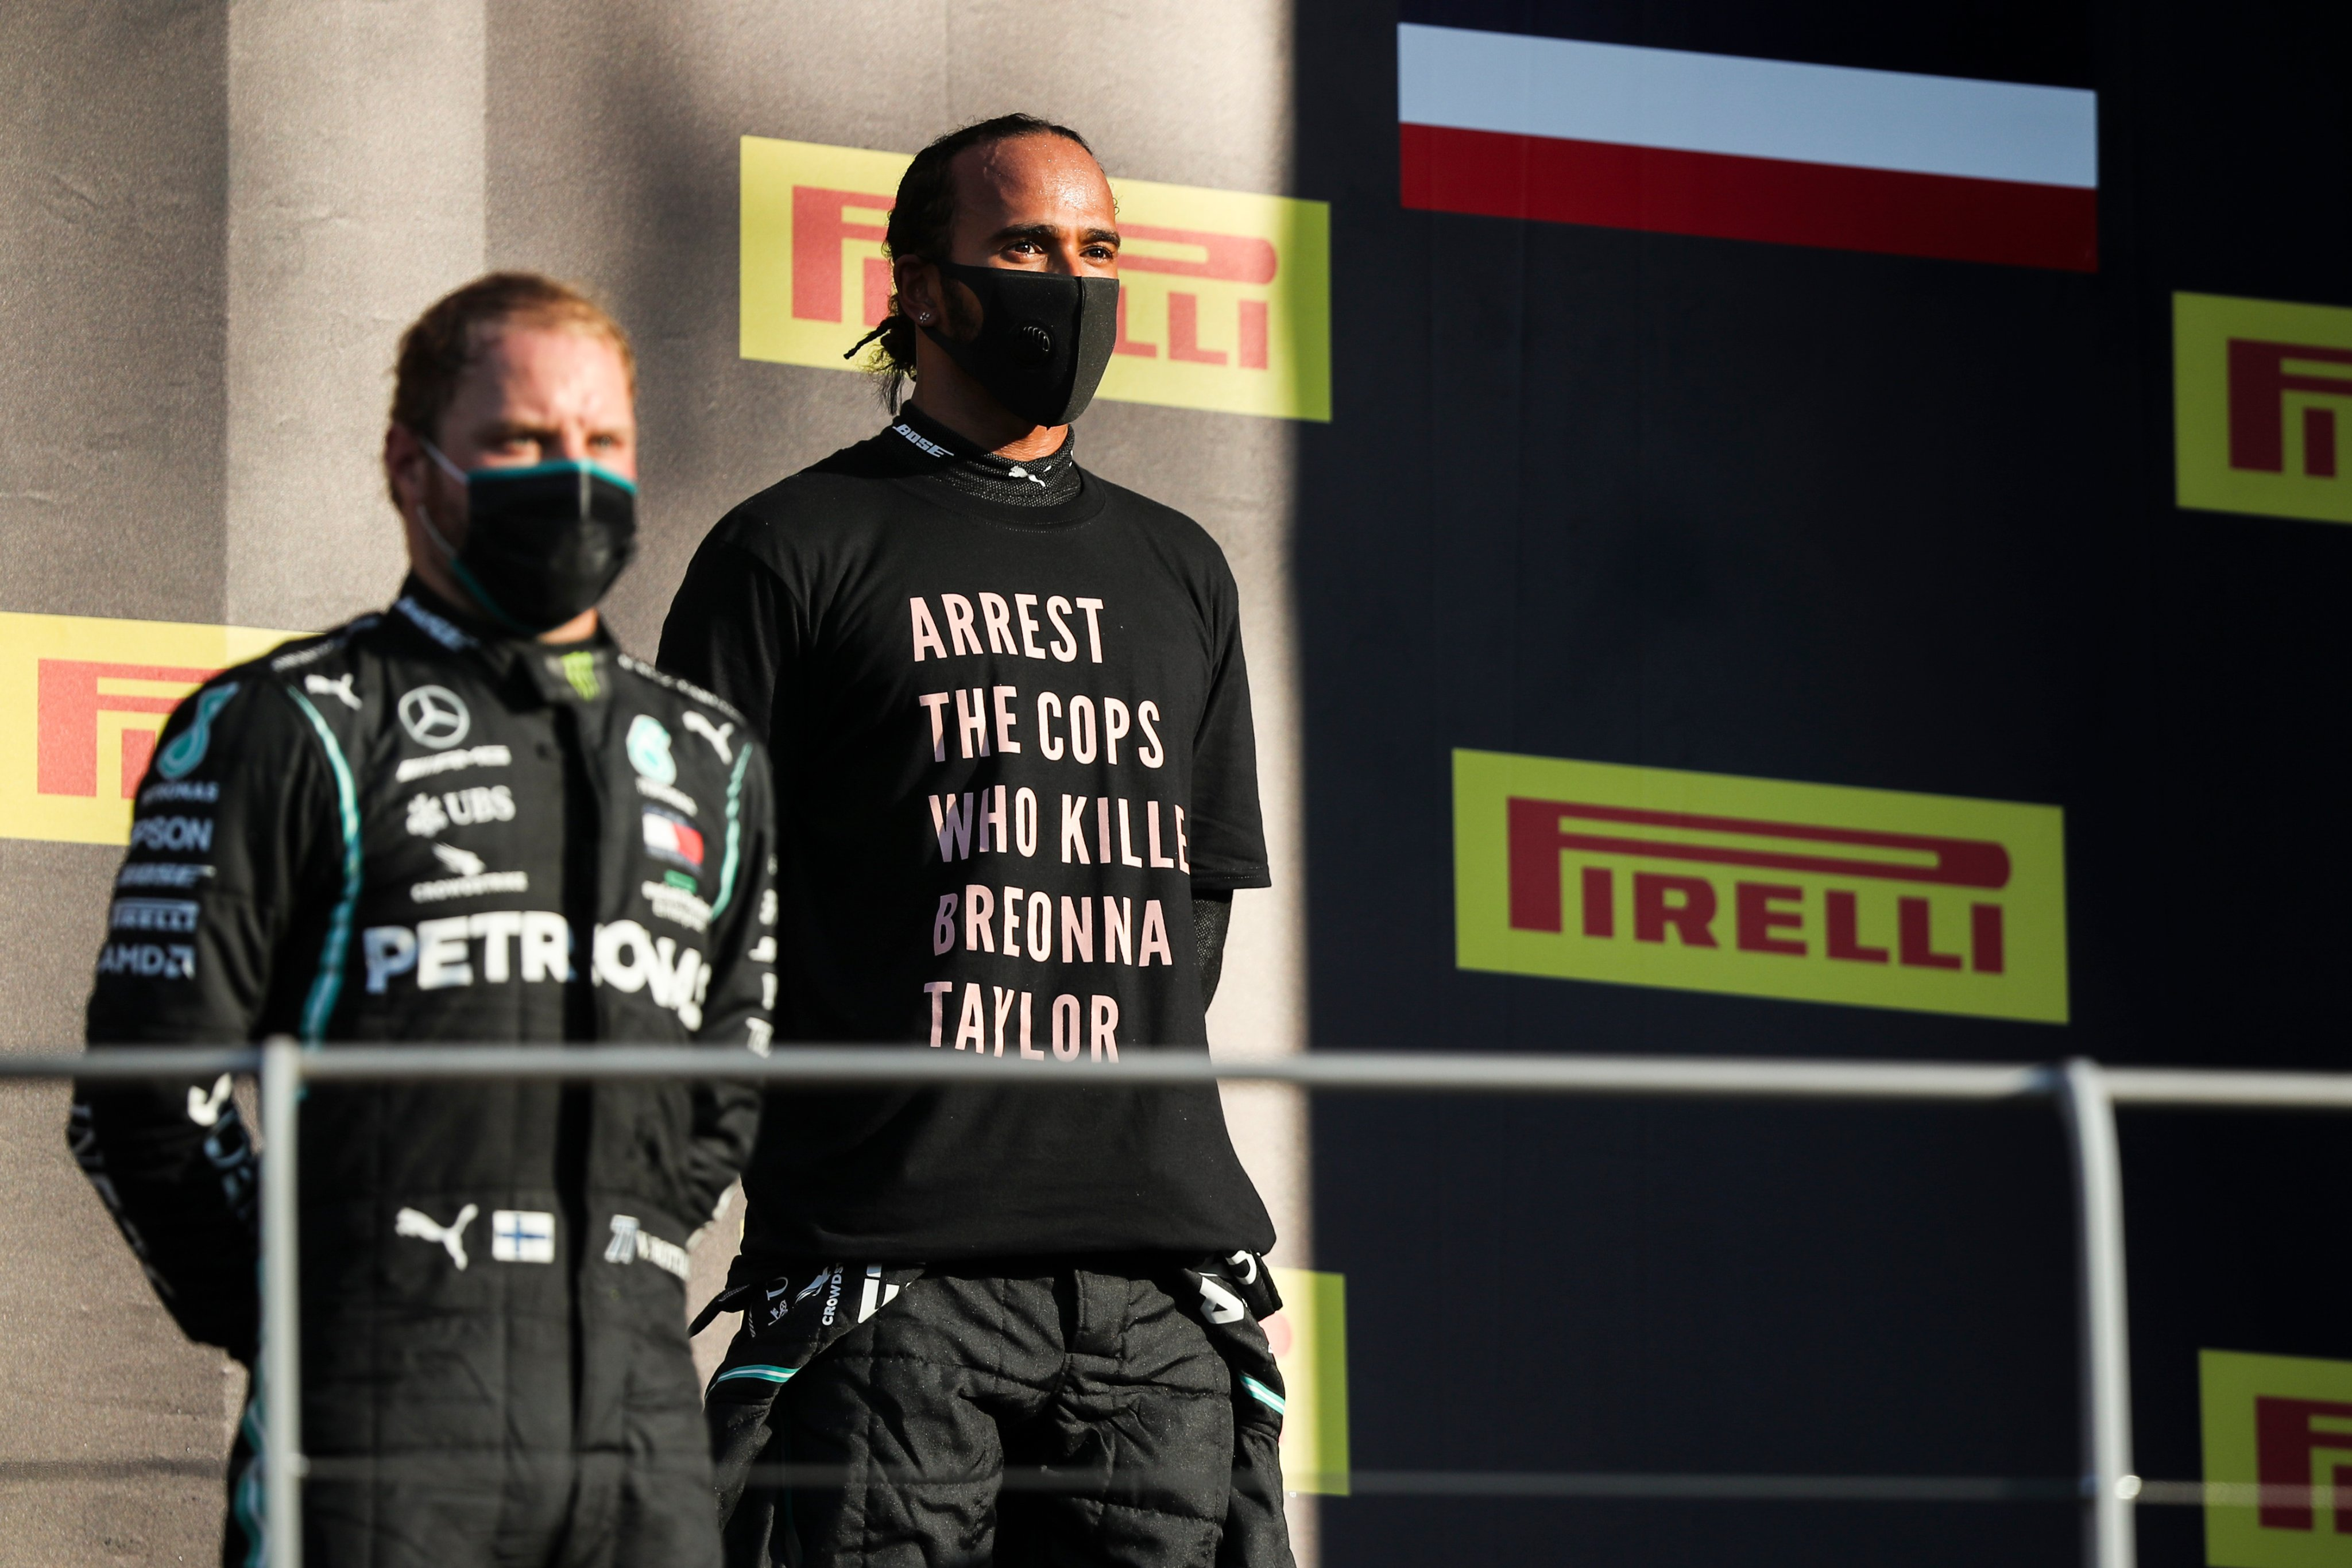 hamilton-podio-breonna-taylor-soymotor.jpg